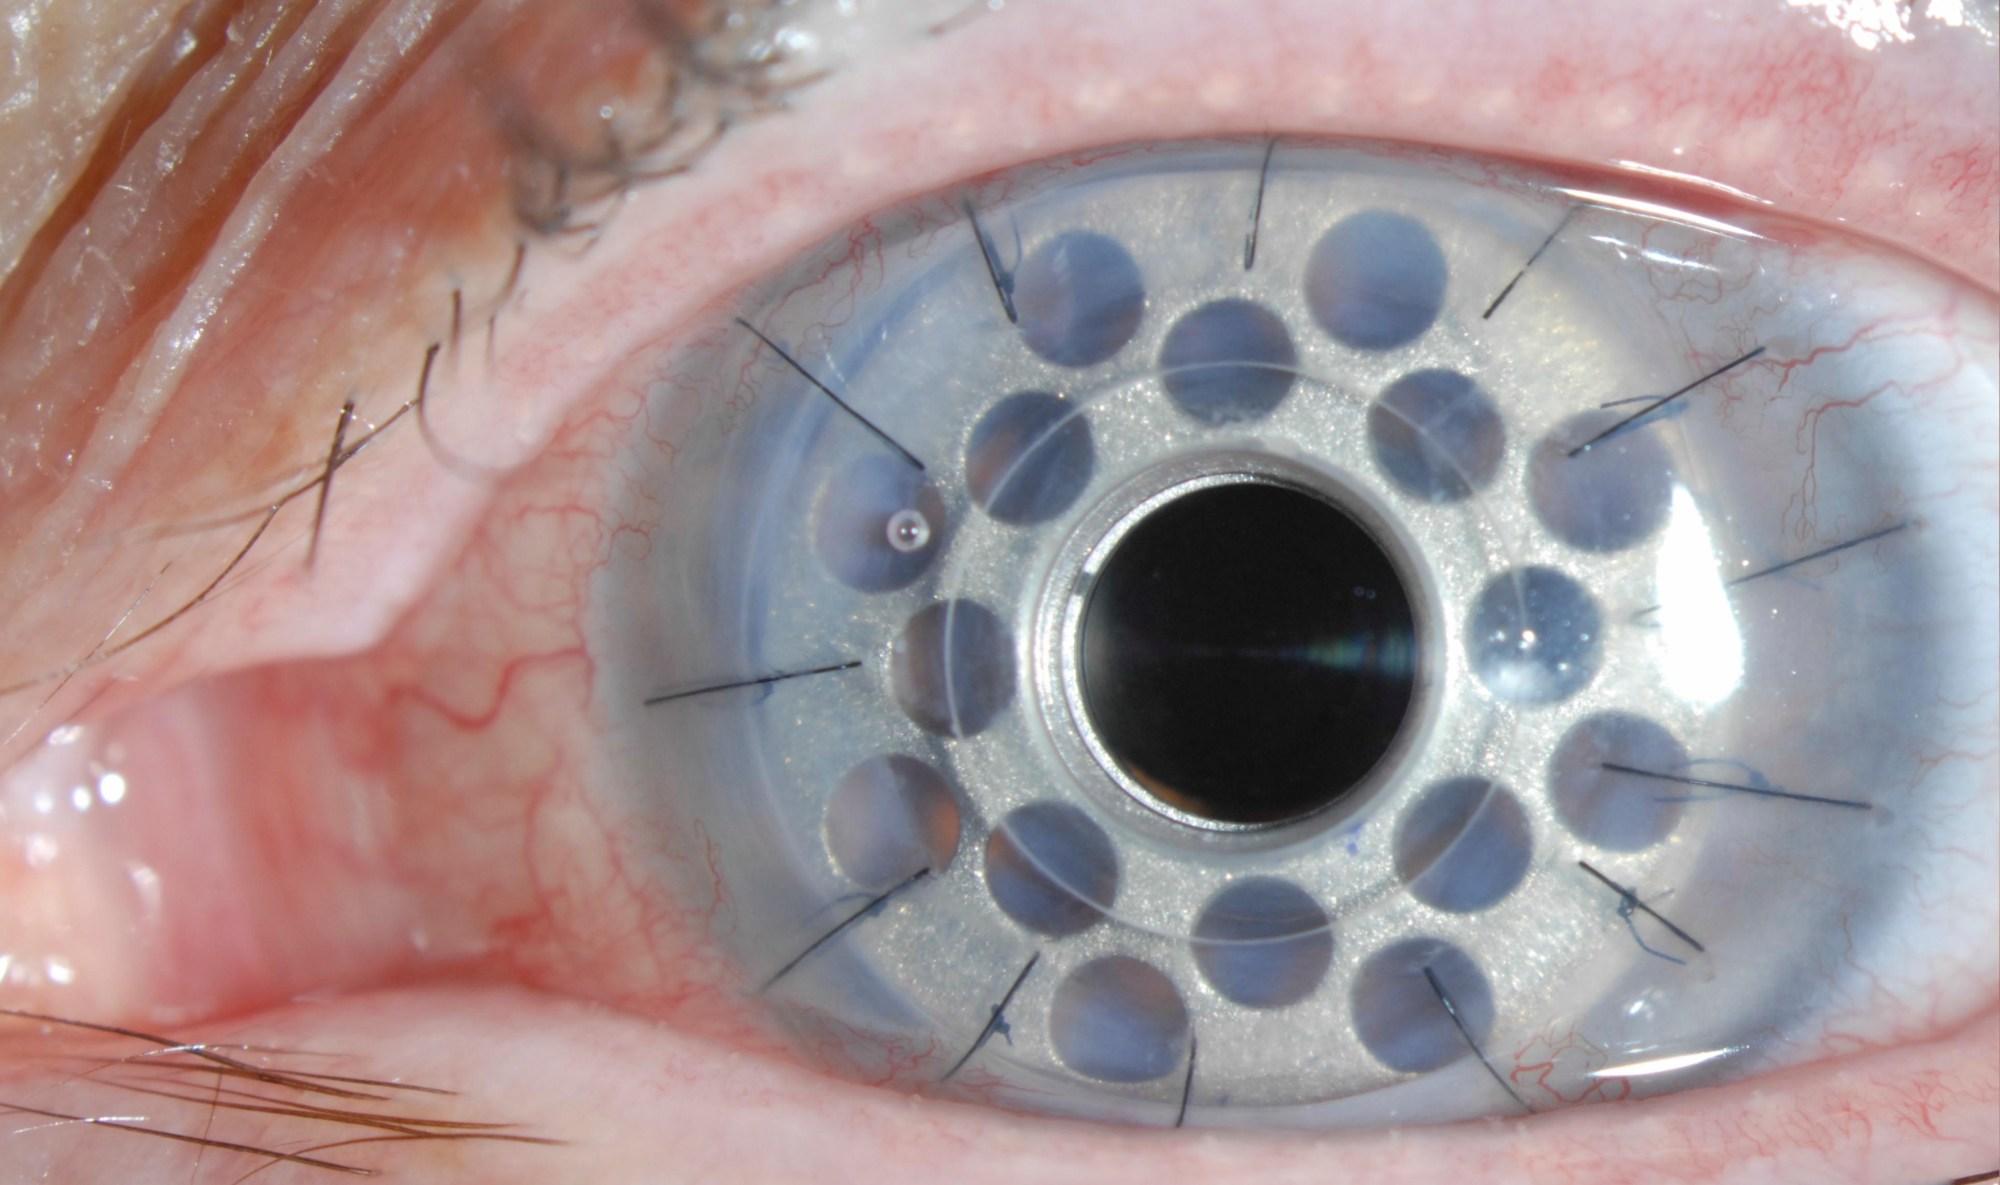 hight resolution of corneal transplantation tauber eye center eye diagram label printable diagram of the eye